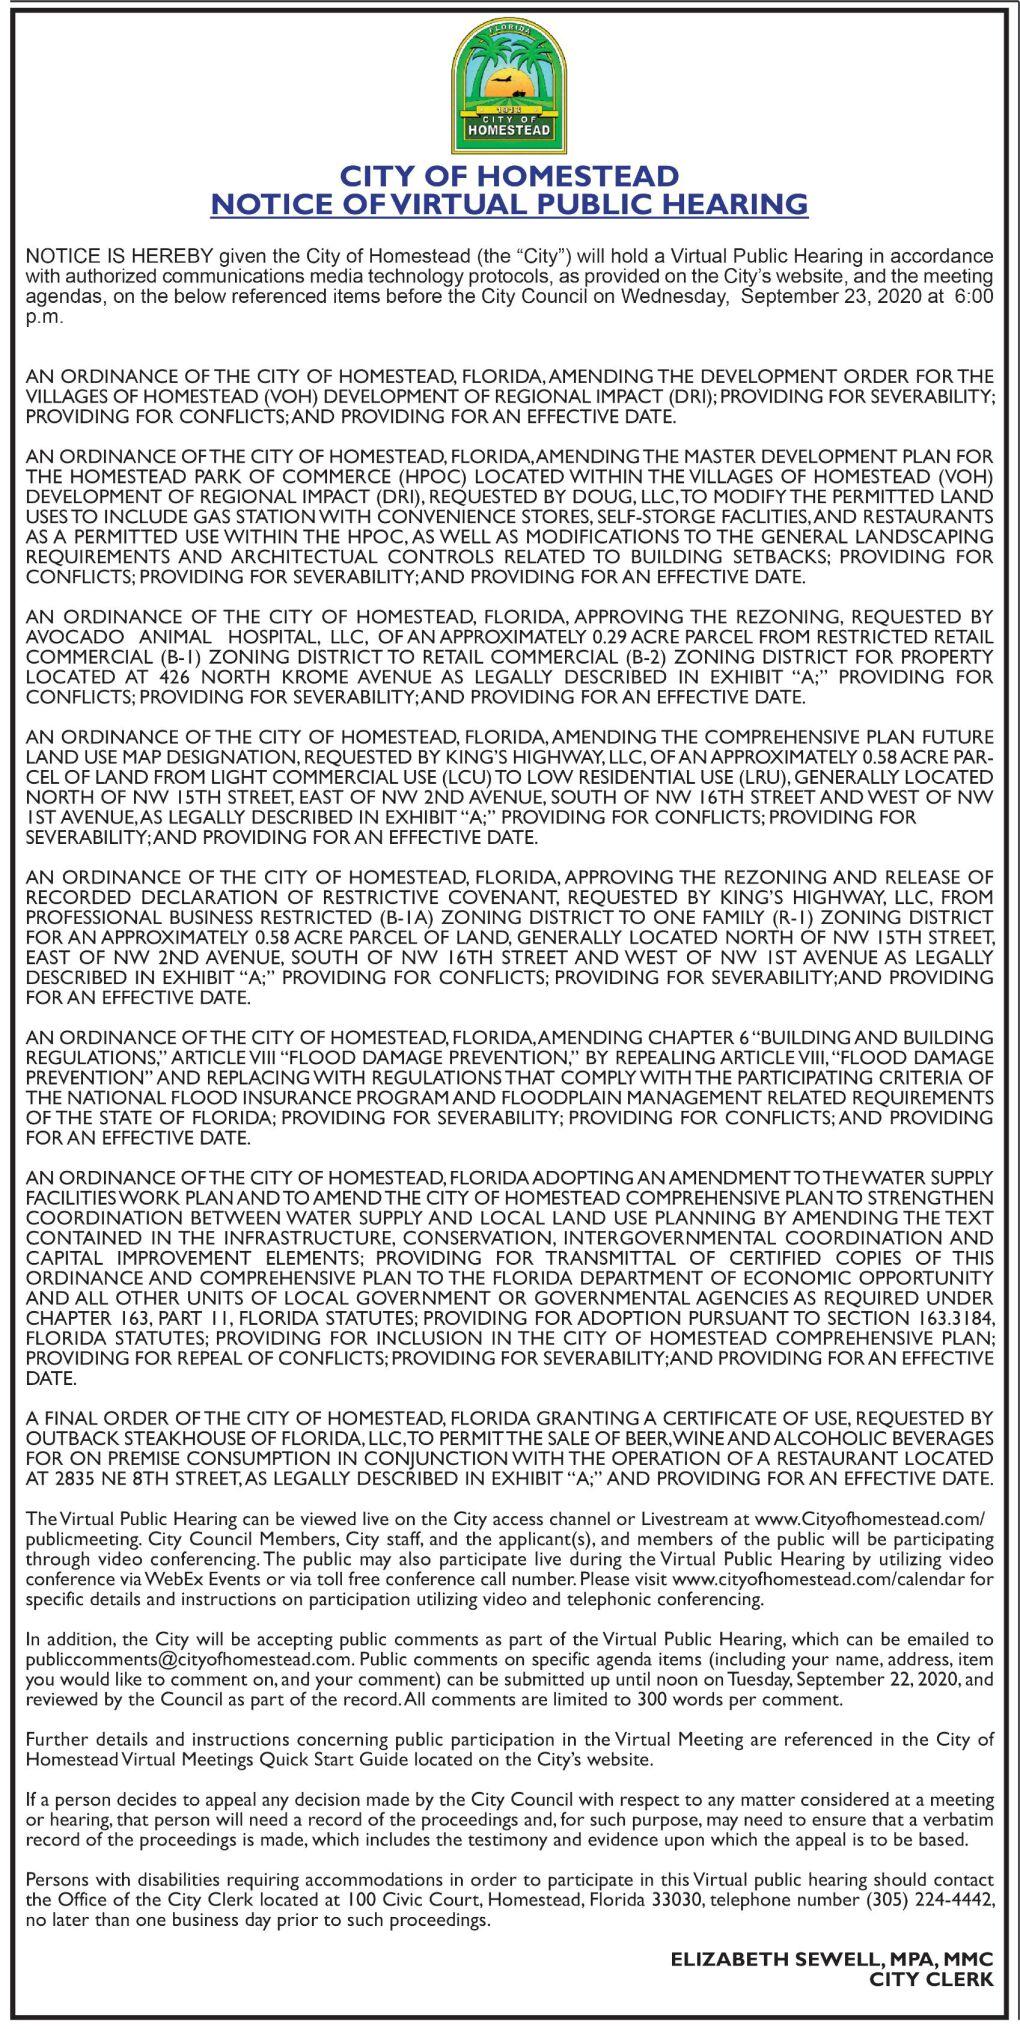 Notice of Virtual Public Meeting - City of Homestead